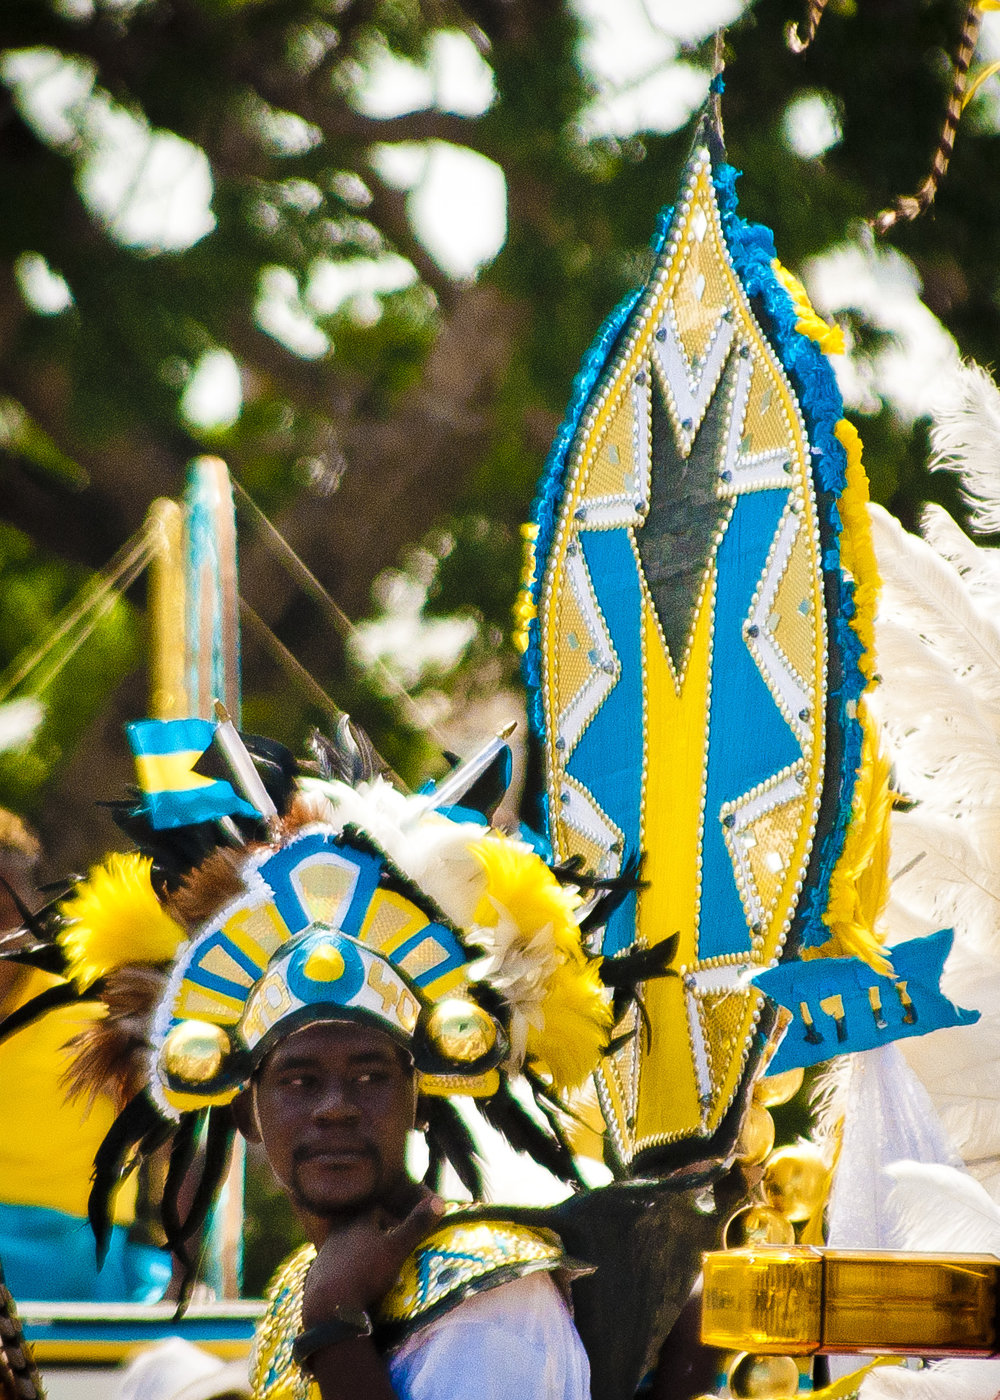 CarnivalIndieBirthday2013 084_1.jpg